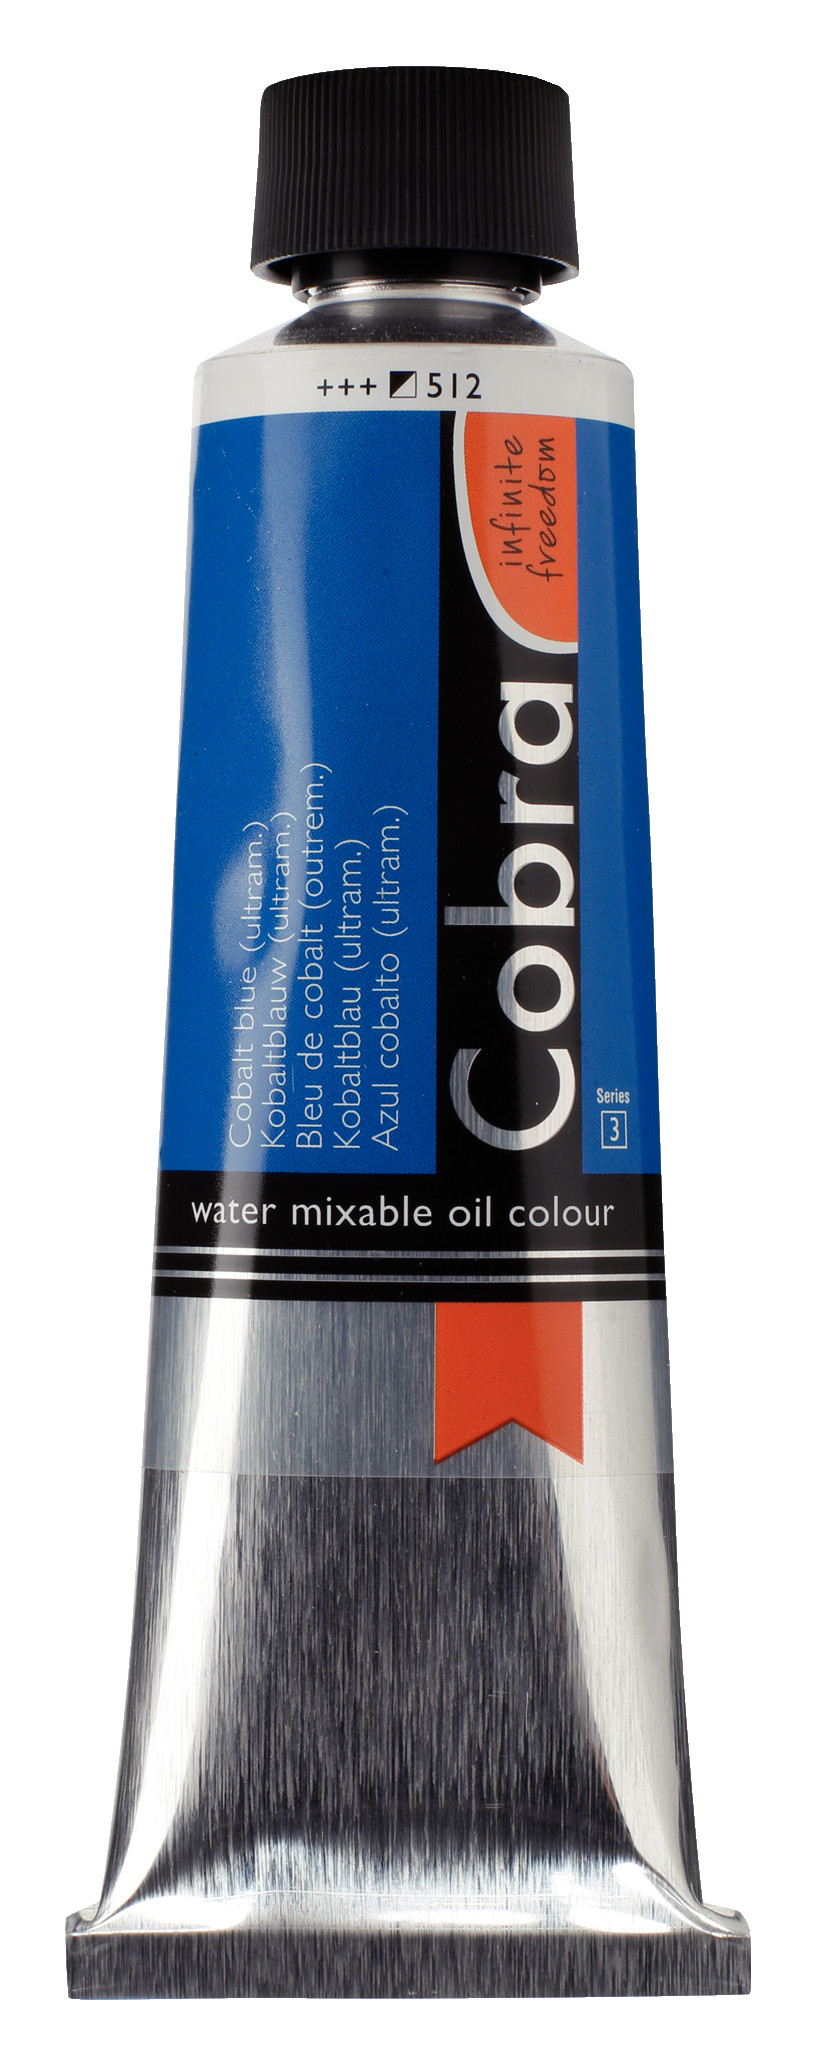 Cobra Artist Water Mixable Oil Colour Tube 150 ml Cobalt blue (ultramine) 512